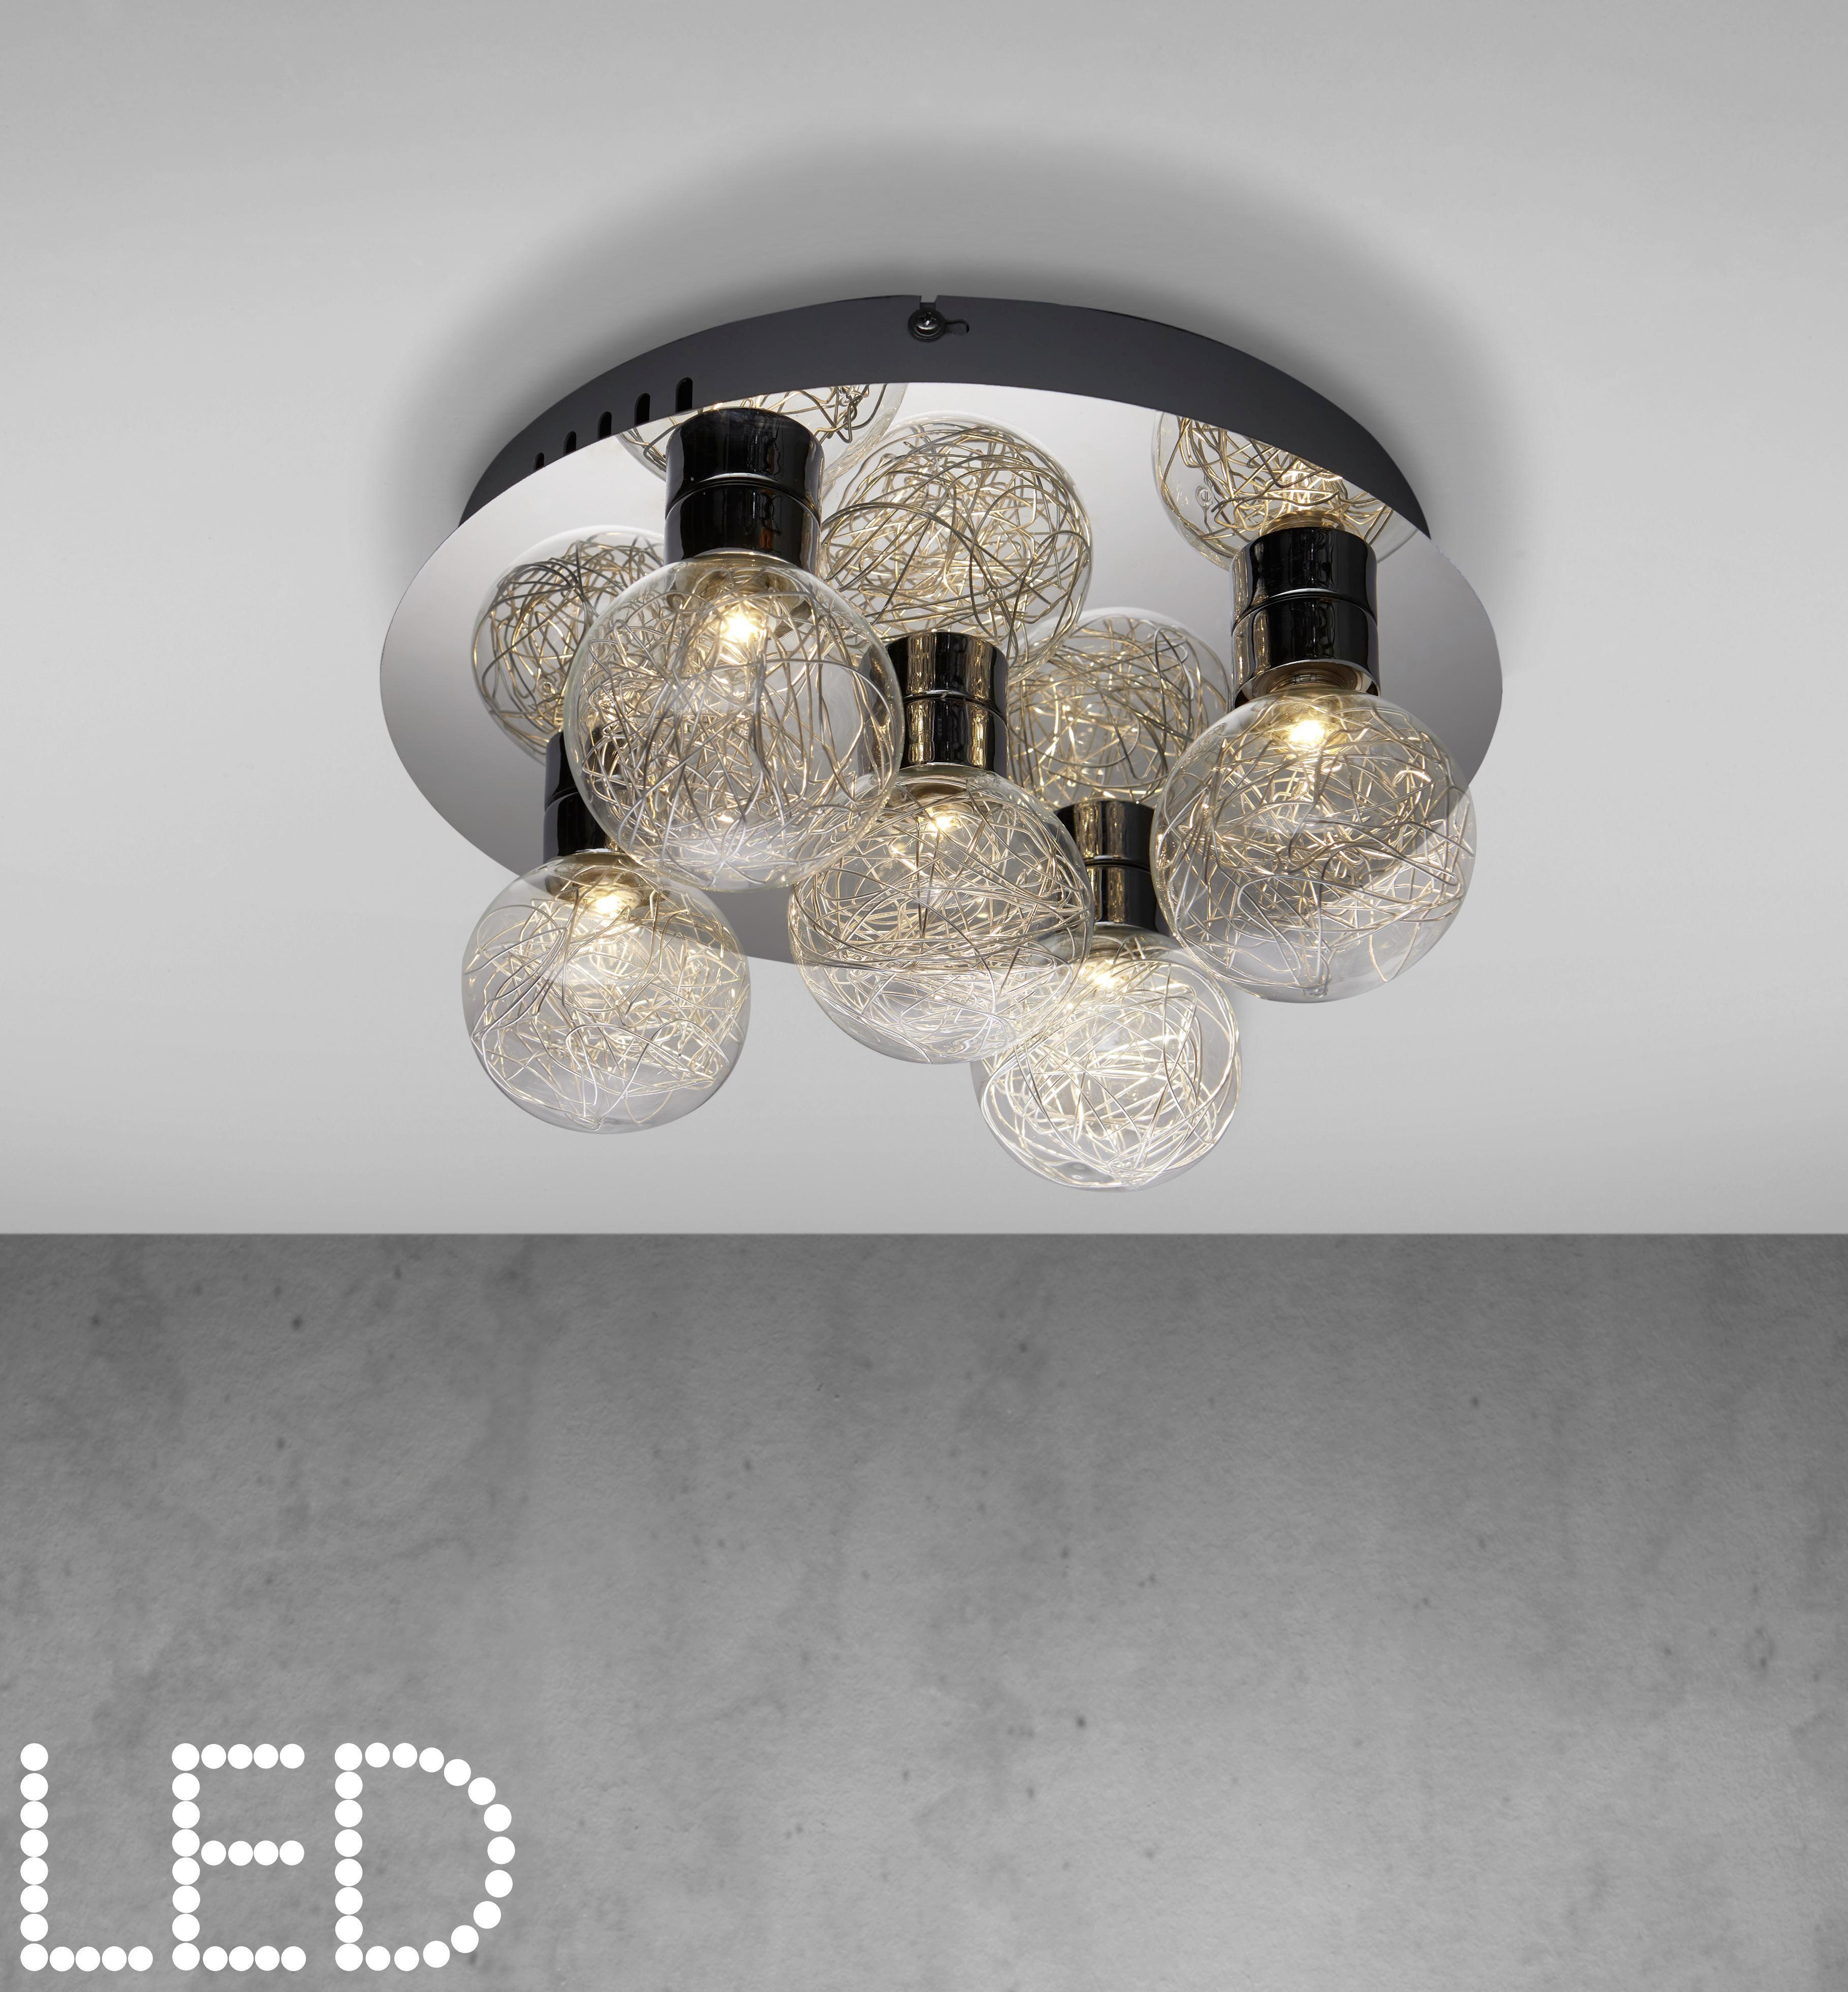 LED-Deckenleuchte Mathis - Chromfarben, MODERN, Glas/Kunststoff (32/14cm) - MÖMAX modern living